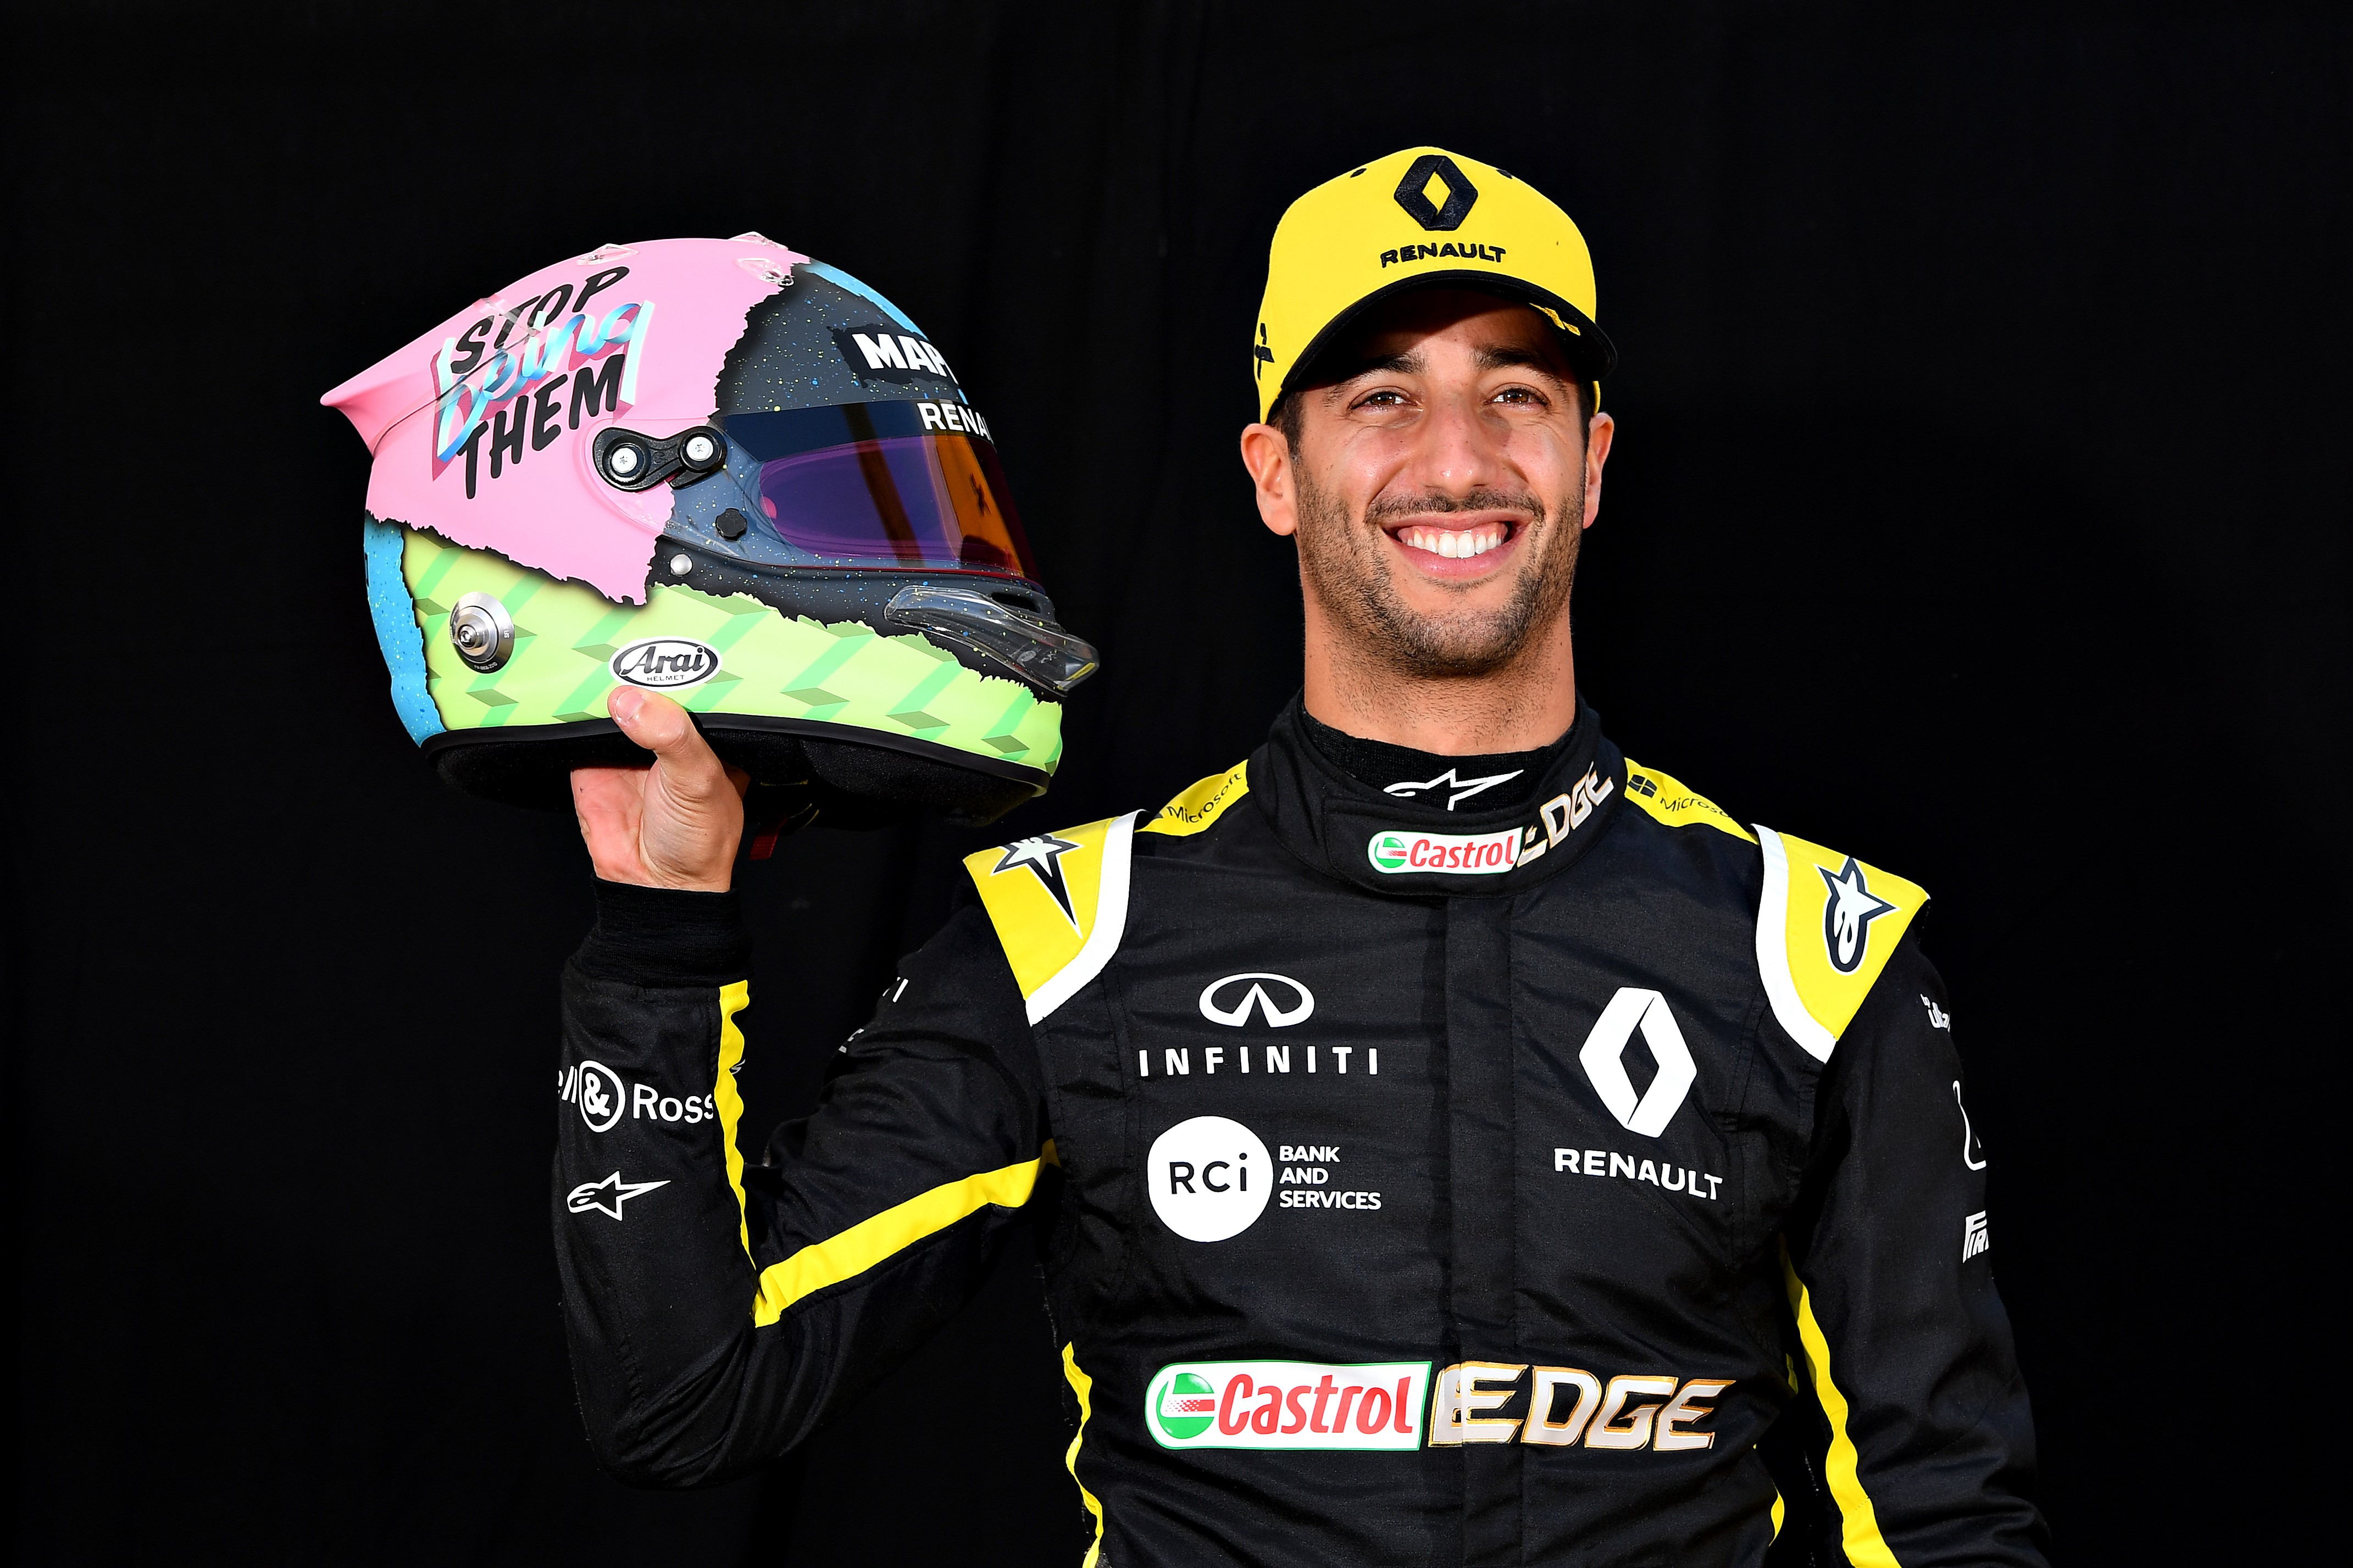 Daniel Ricciardo (Renault) au Grand Prix d'Australie 2019